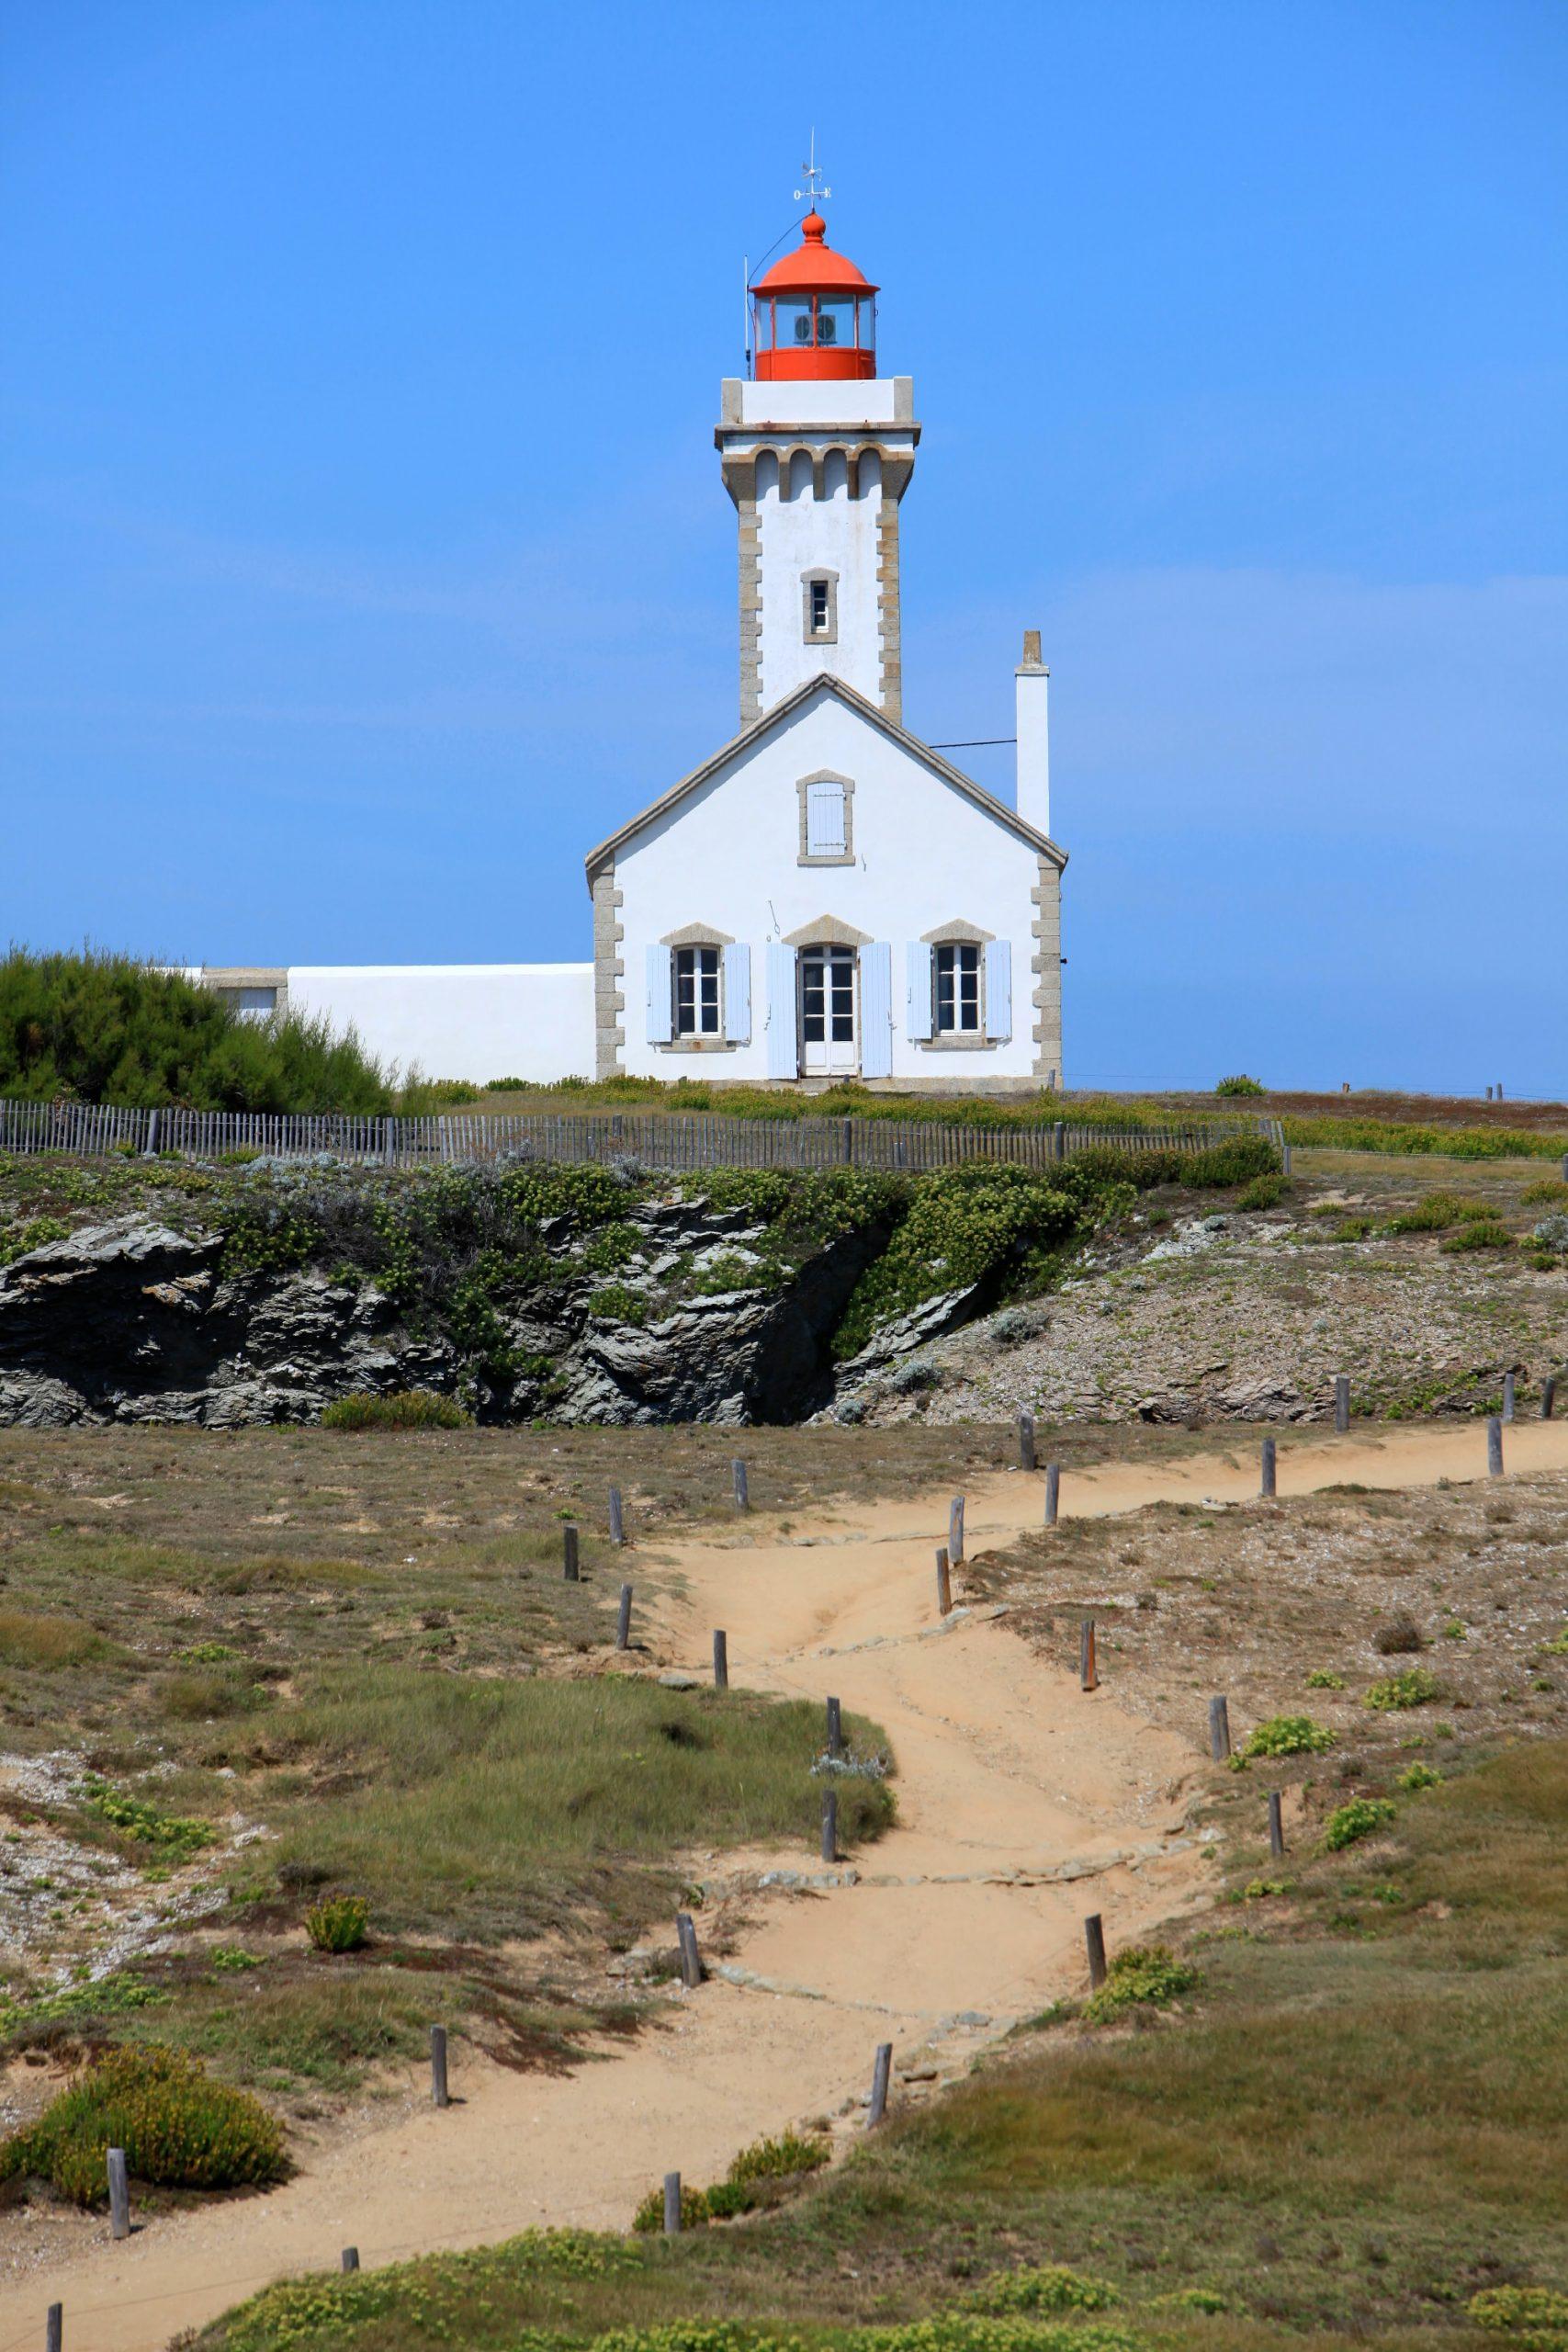 Plein Phare, le podcast breton : Phare des Poulains par Marc Schaeffner